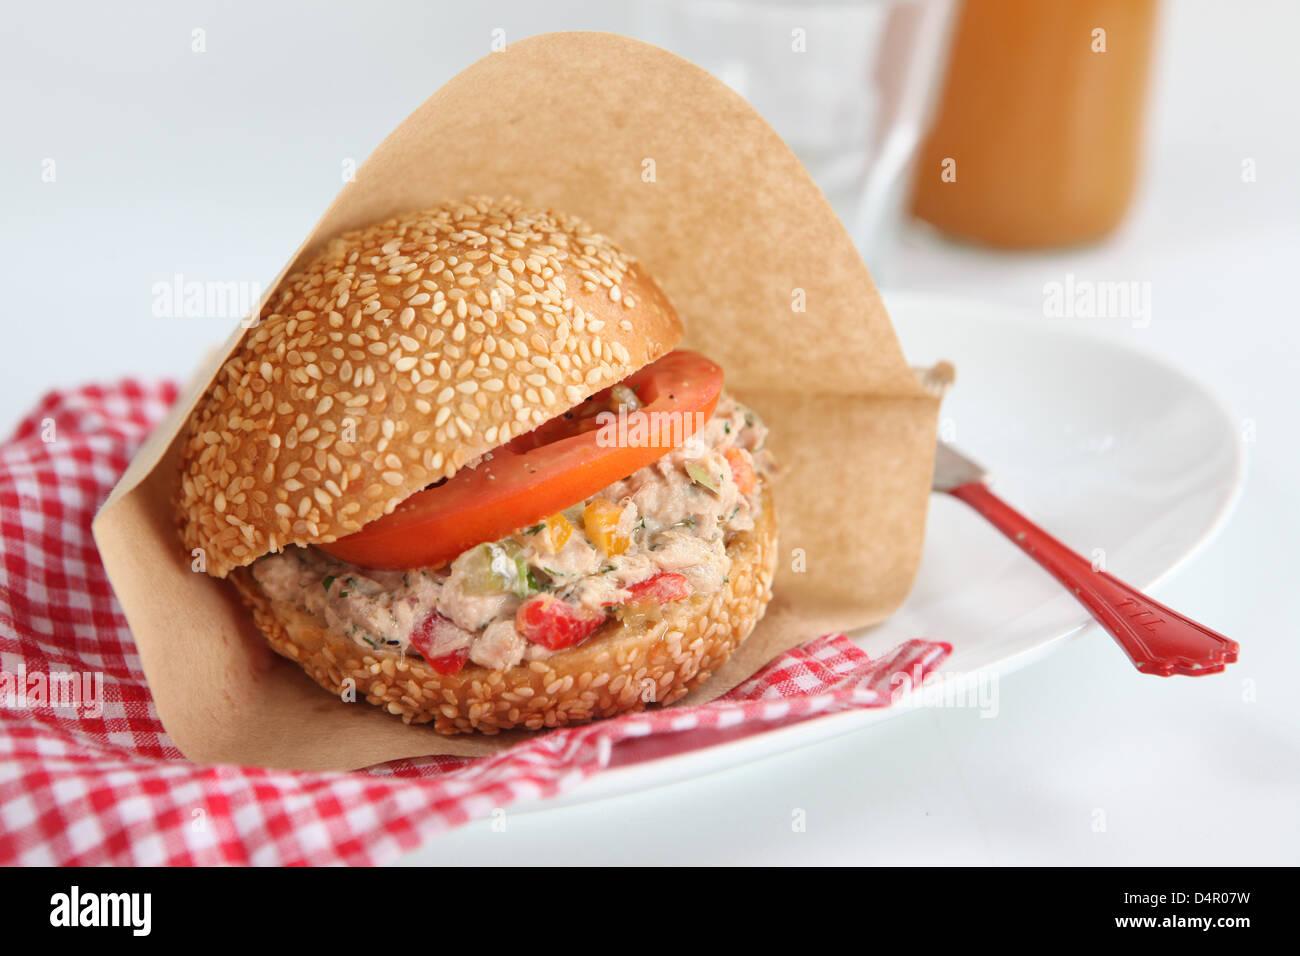 Tuna salad sandwich with tomato - Stock Image